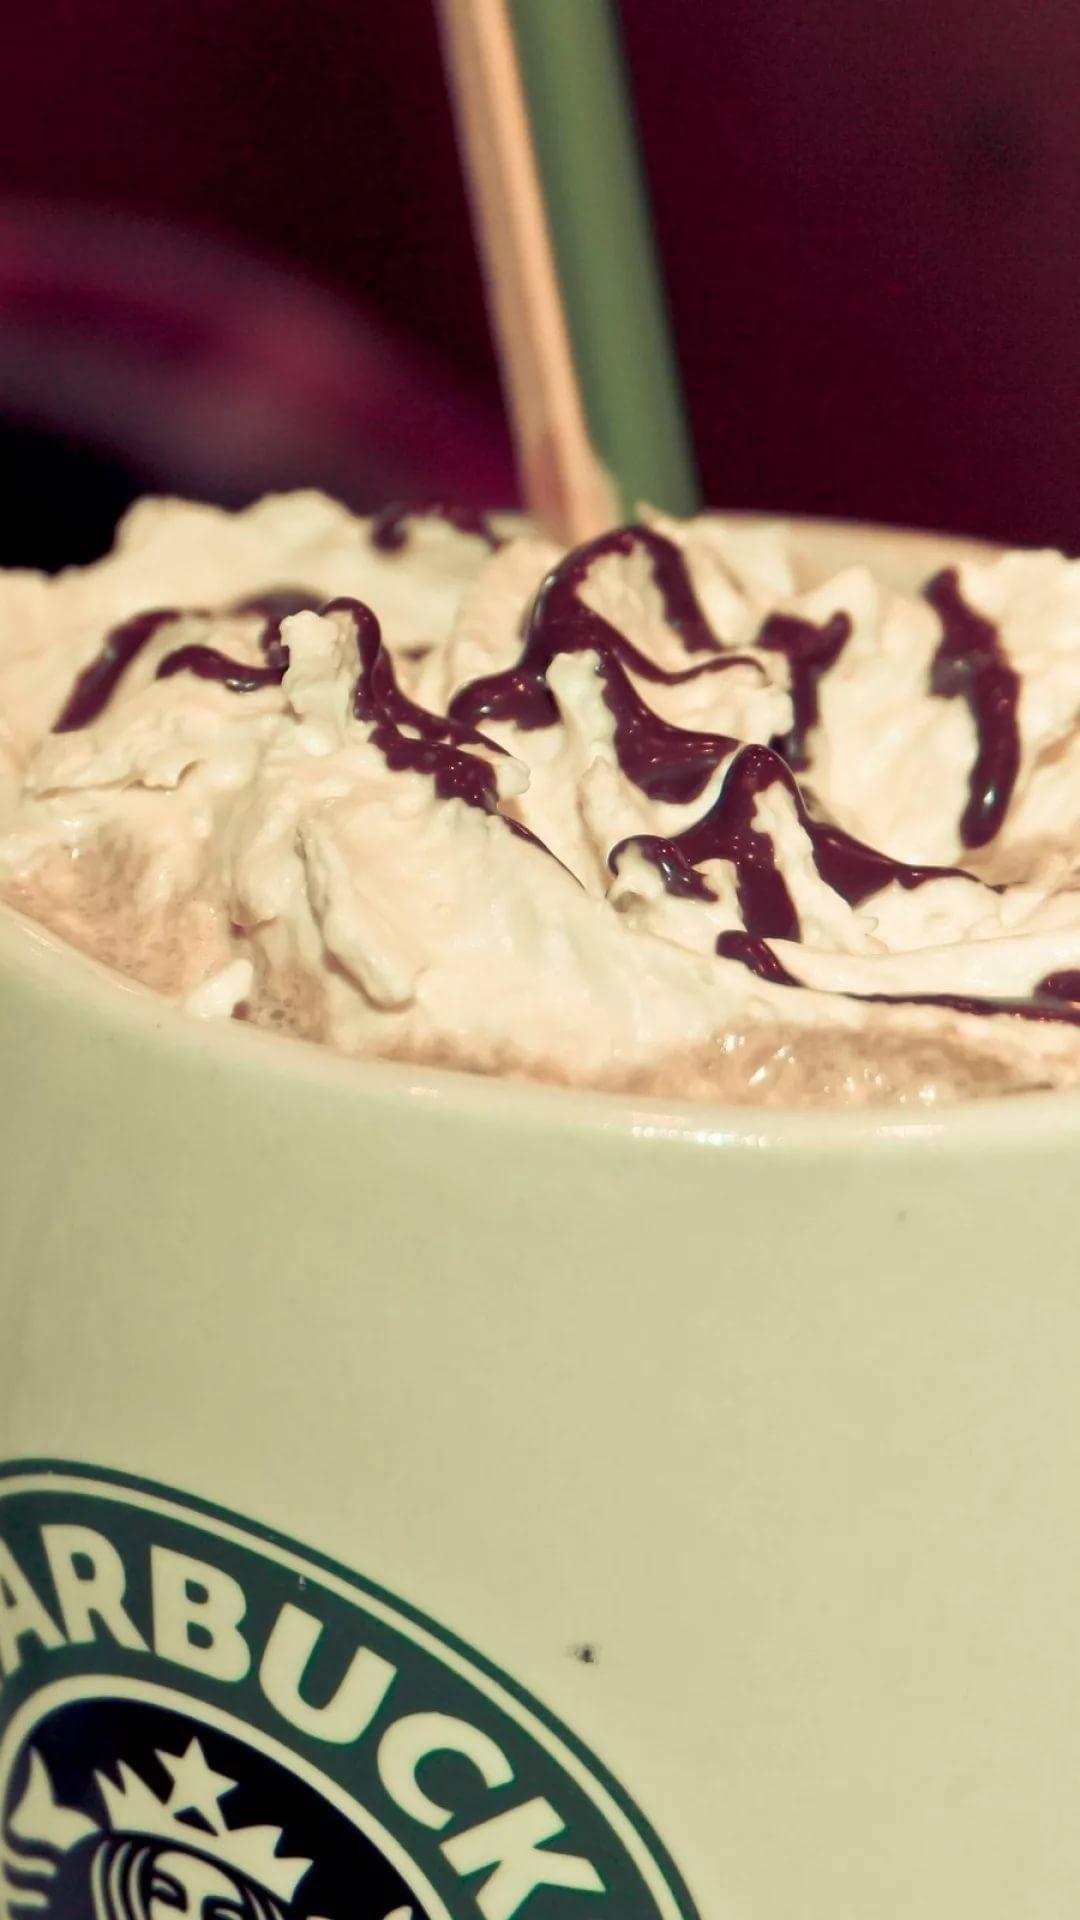 Starbucks free wallpaper for Android